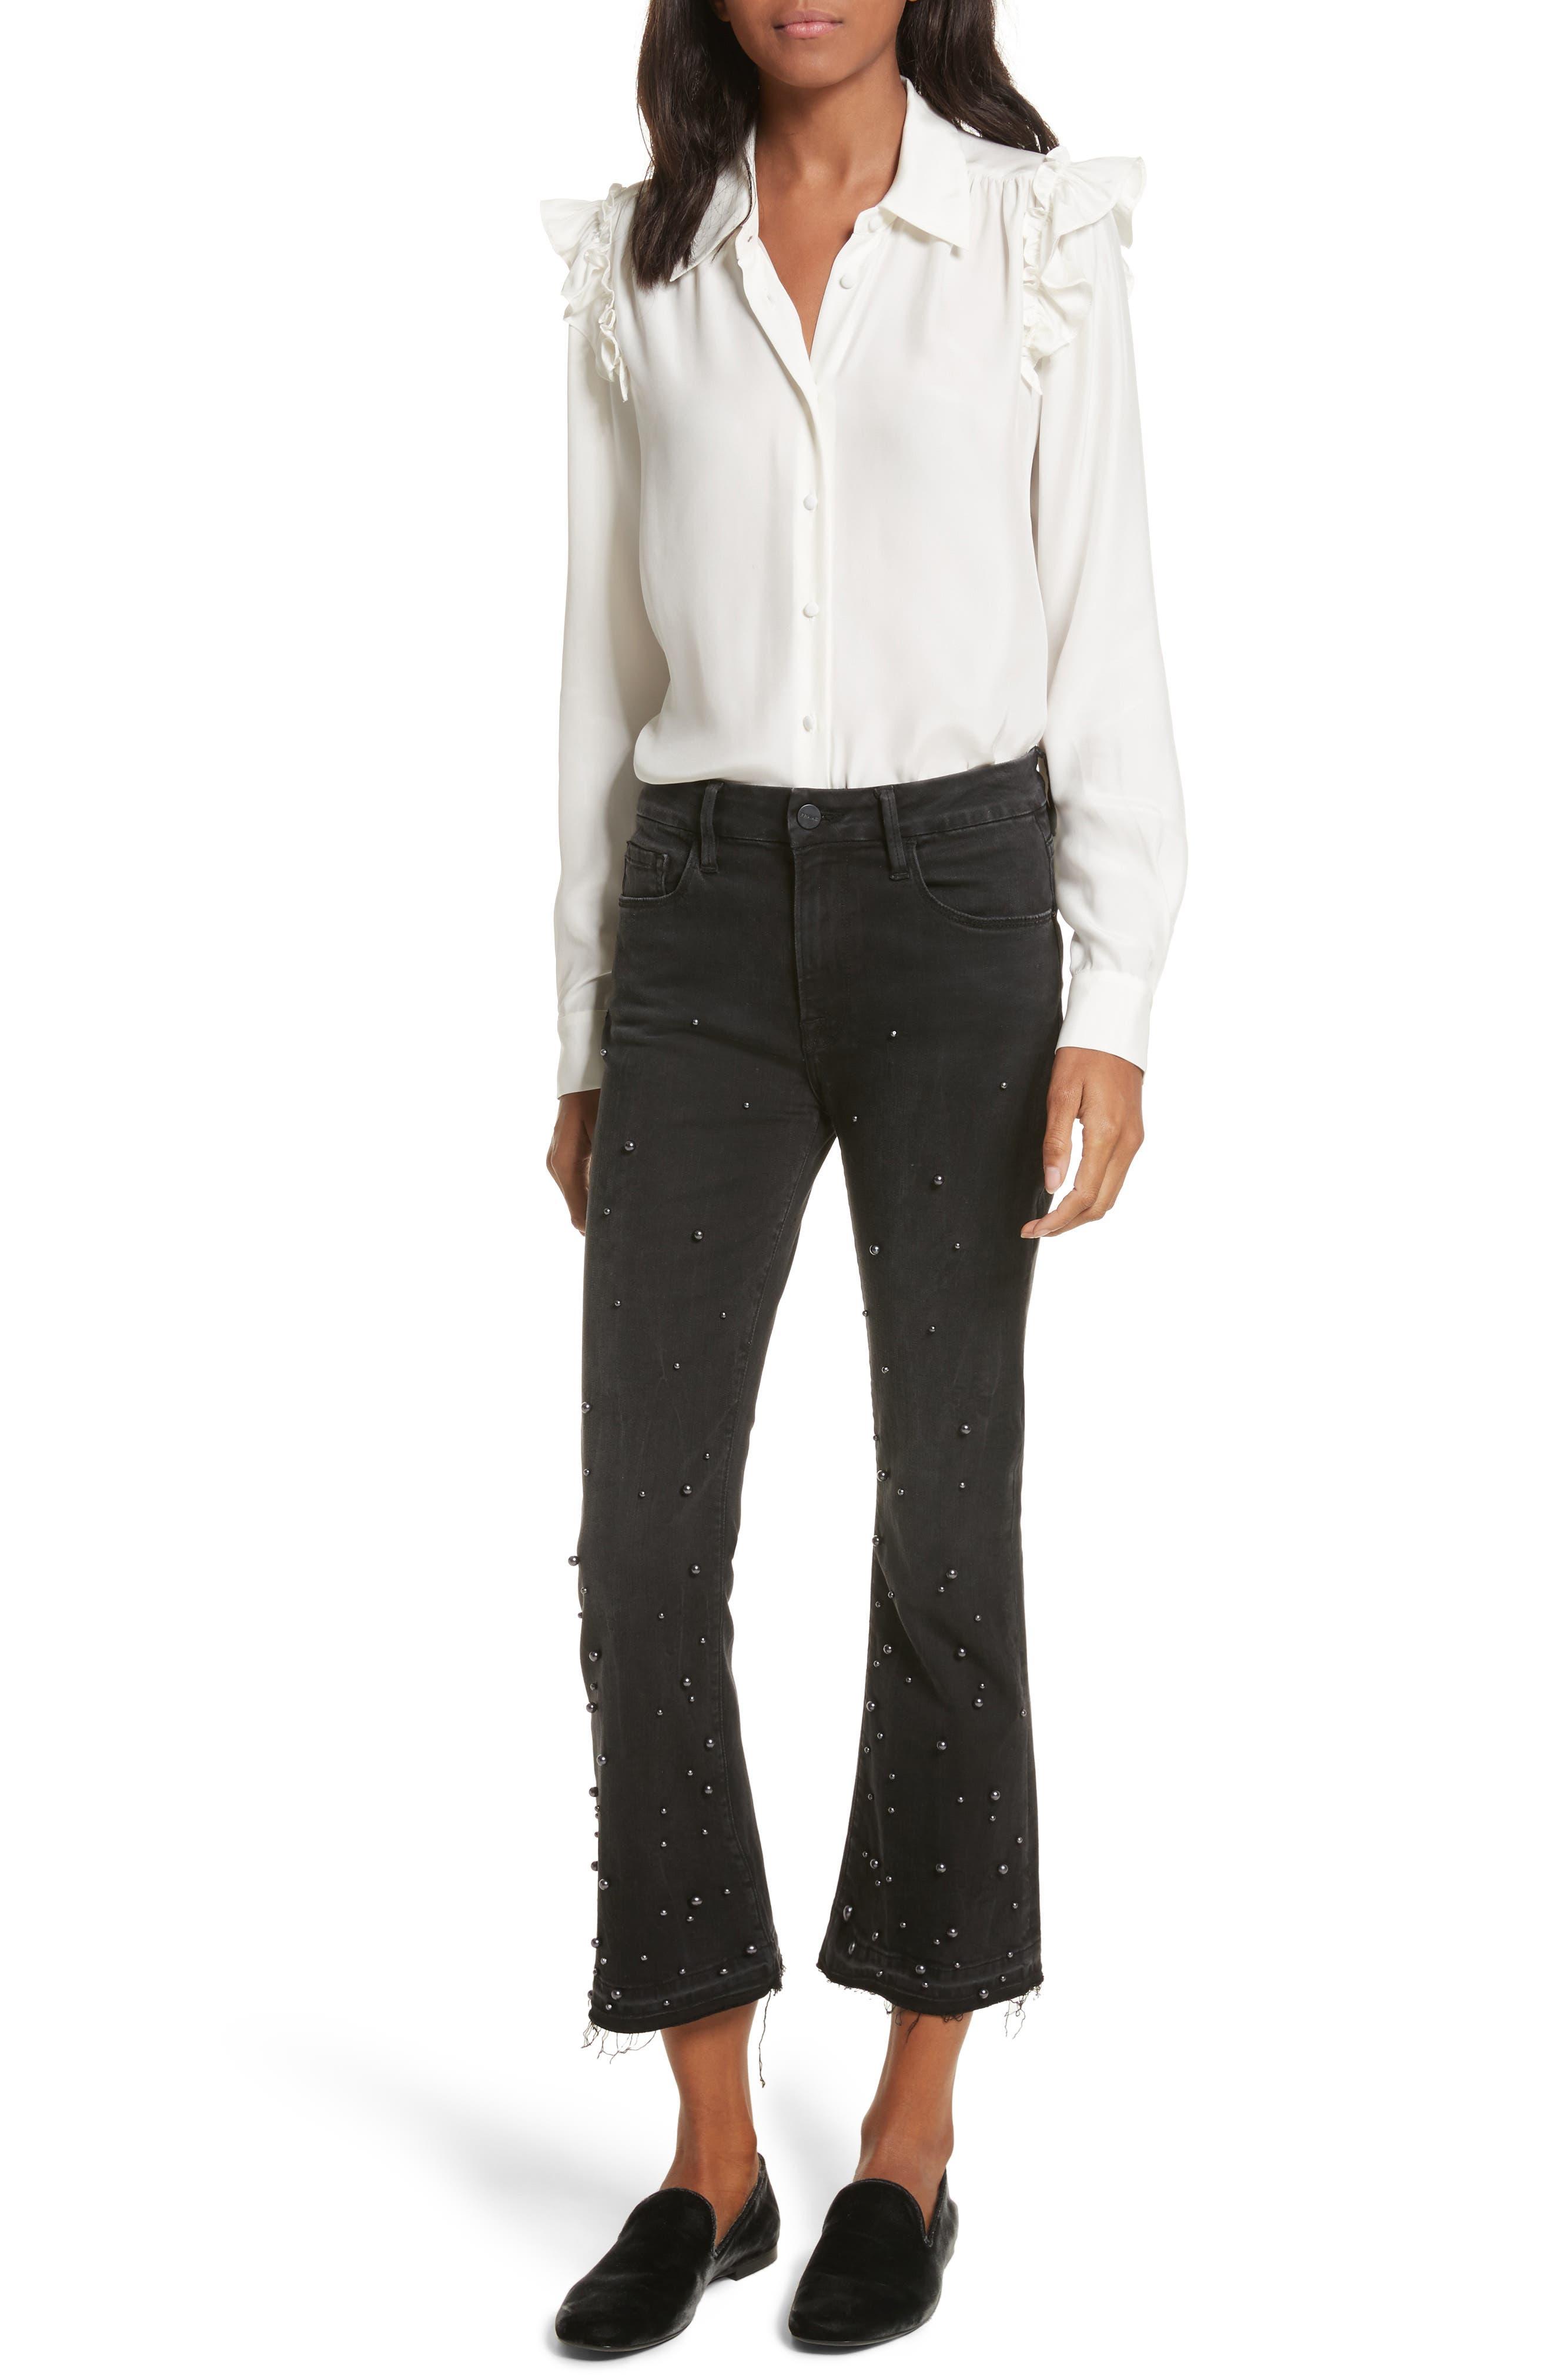 Frame Le Crop Mini Boot Released Hem Embellished Jeans in Mott Street np6IKQLtm4